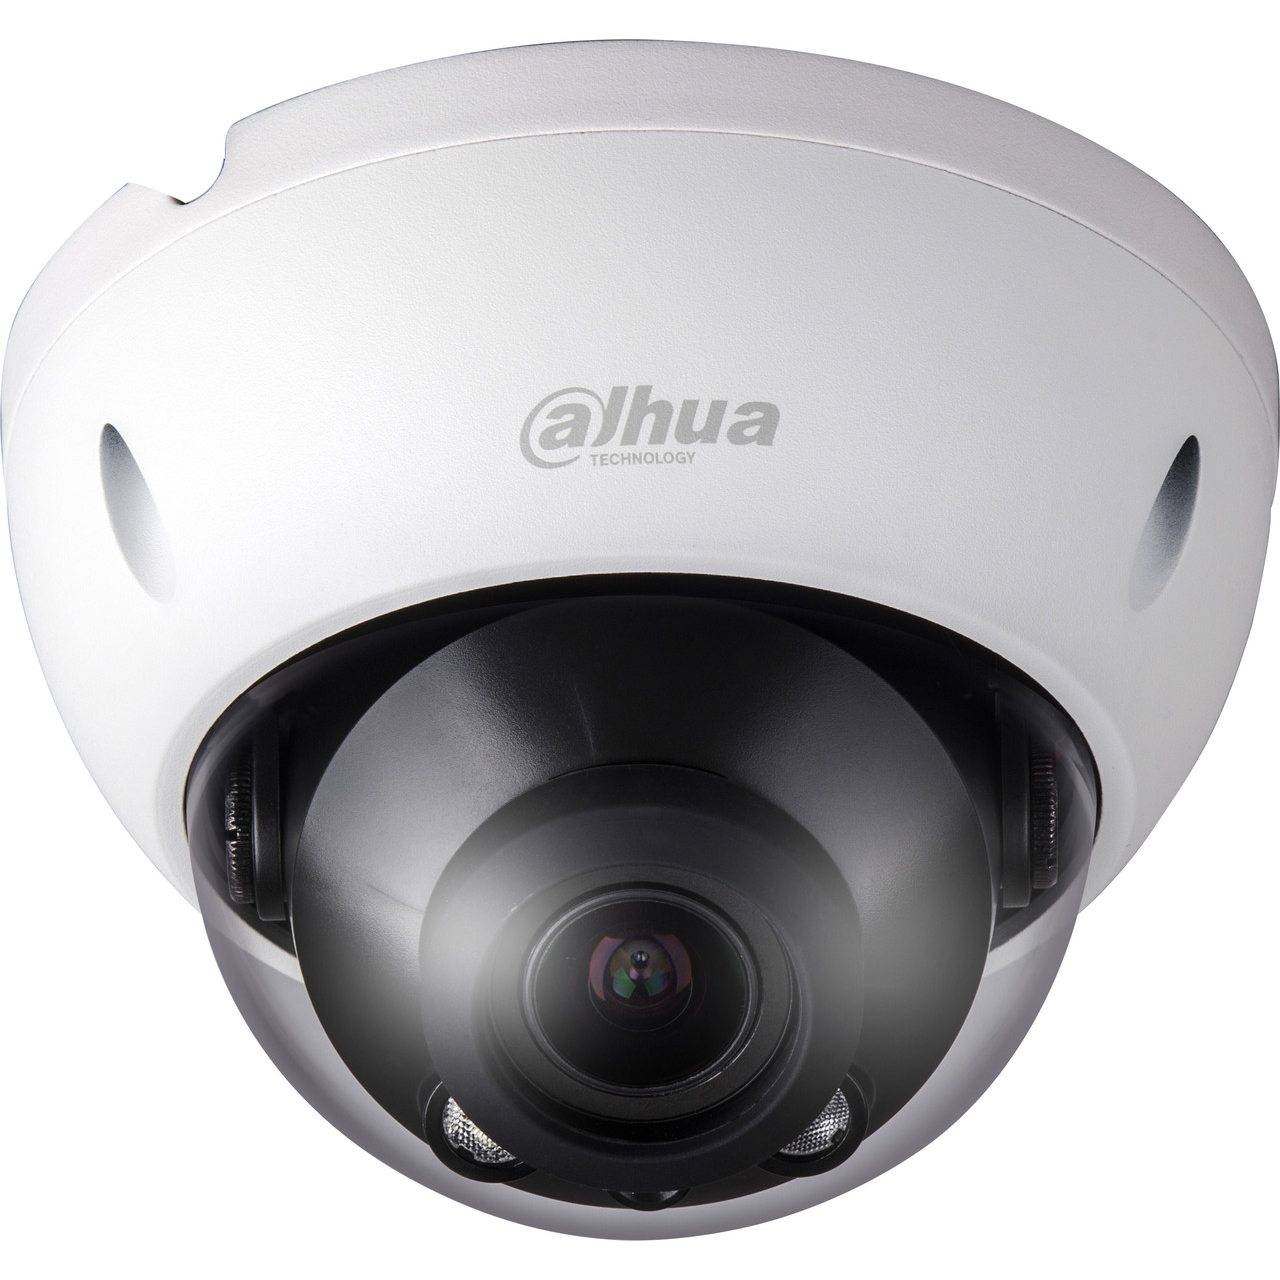 IP камера Dahua DH-IPC-HDBW5241EP-ZE уличная купольная 2Мп, моториз.объектив 2.7-13.5мм, WDR, MicroSD, ИК до